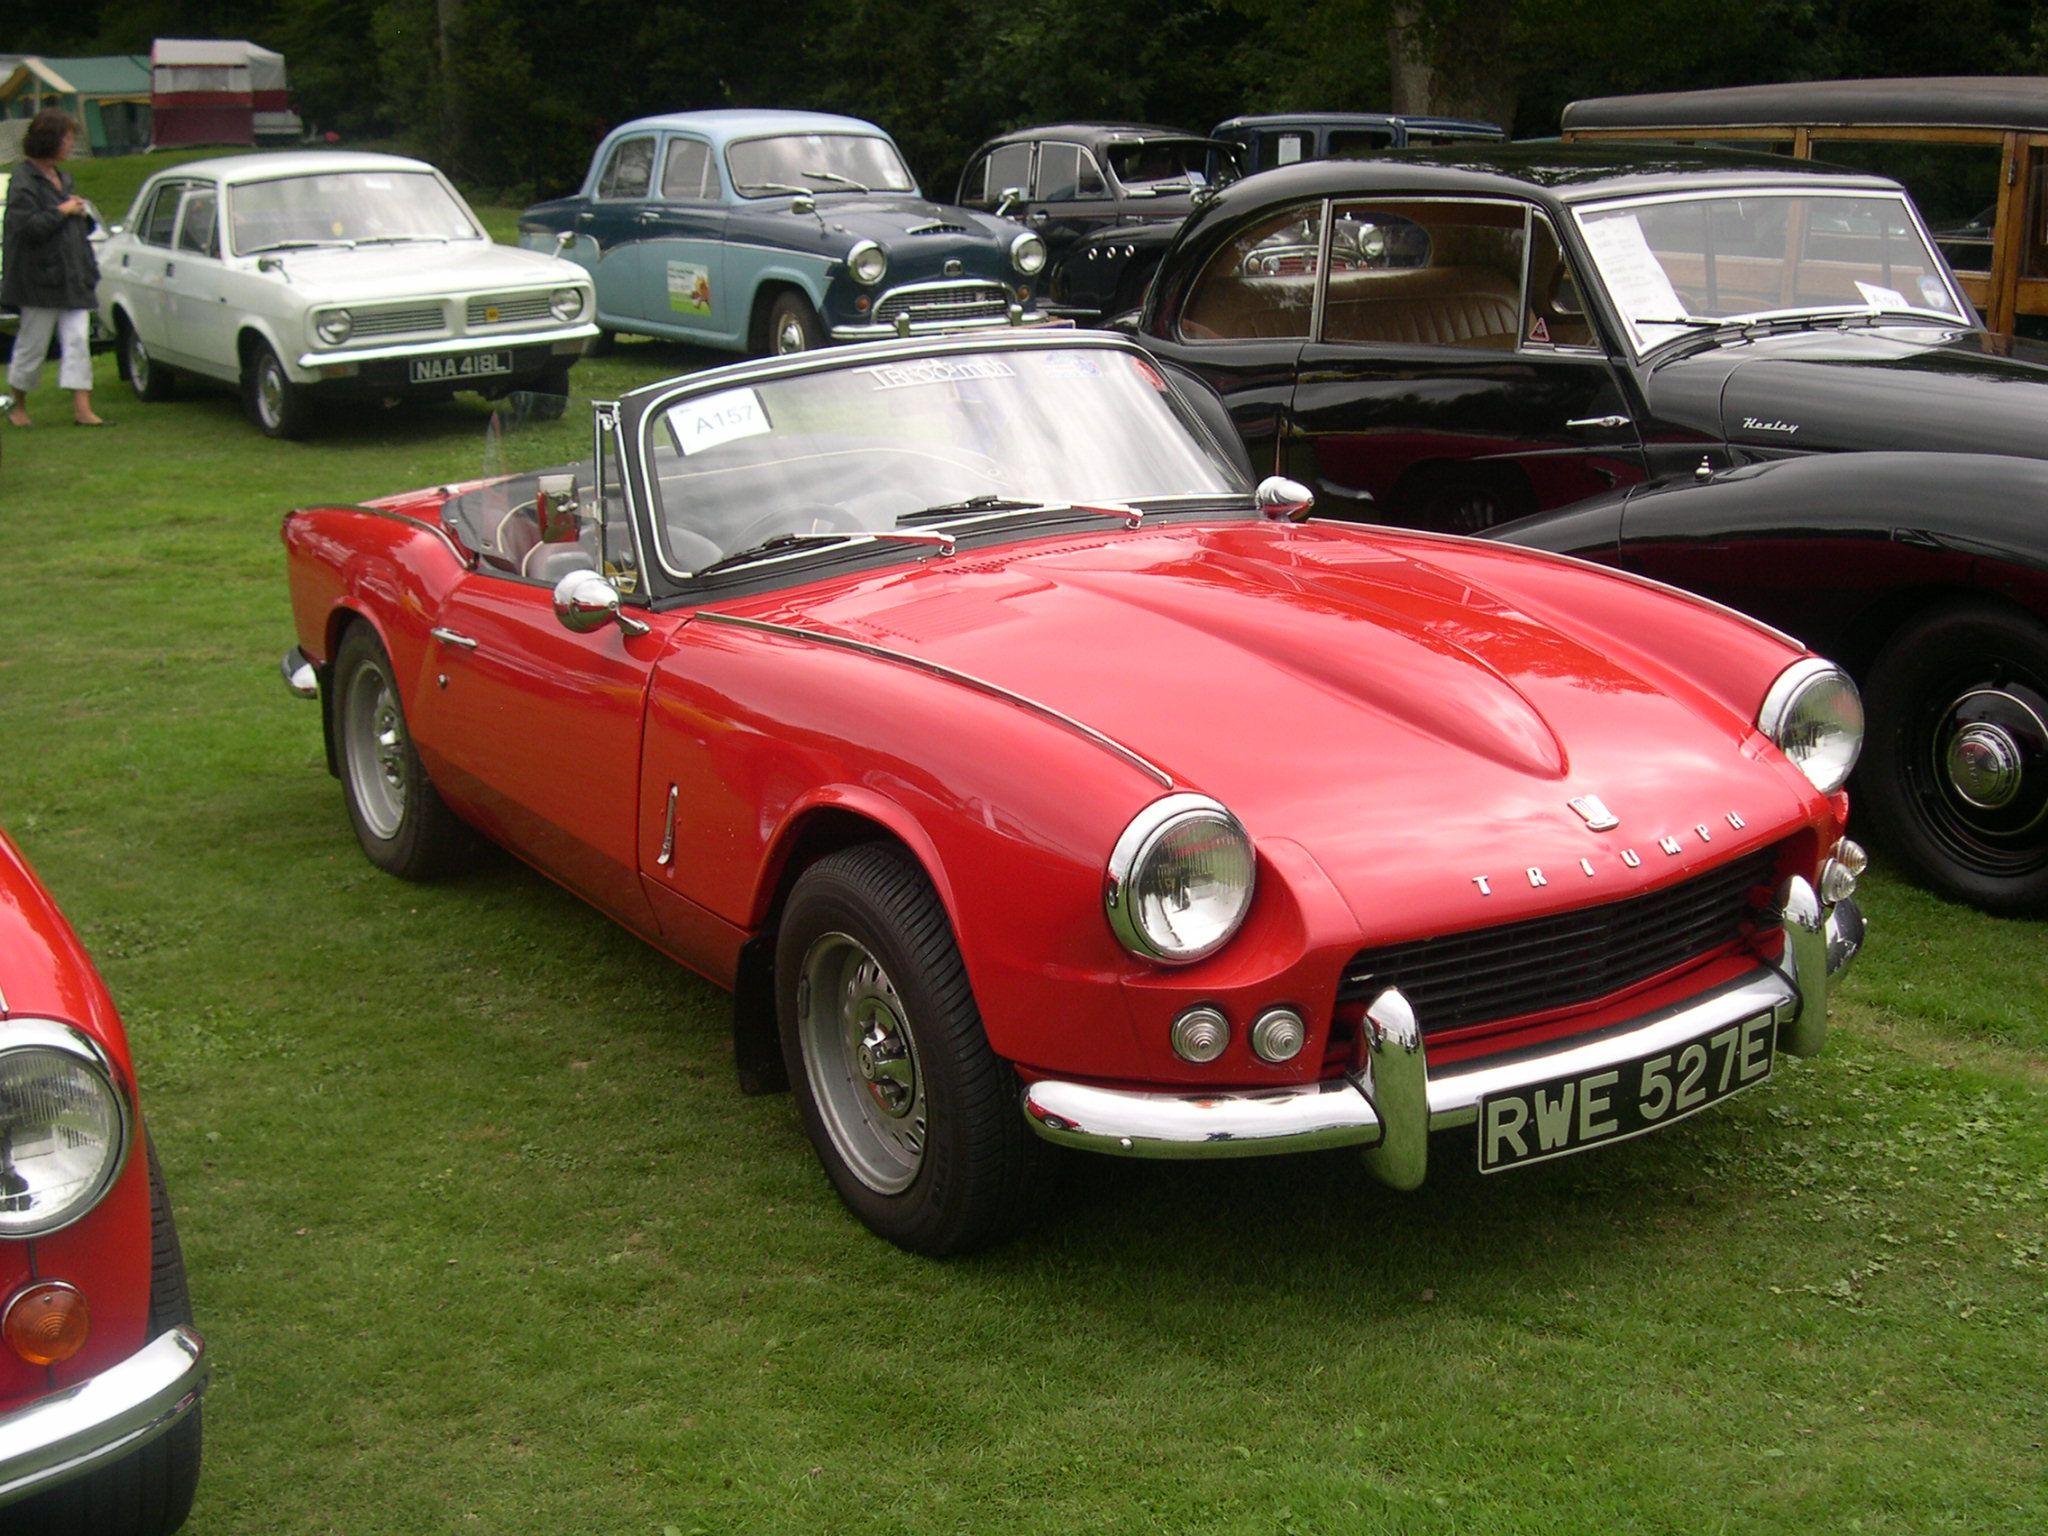 1967 spitfire